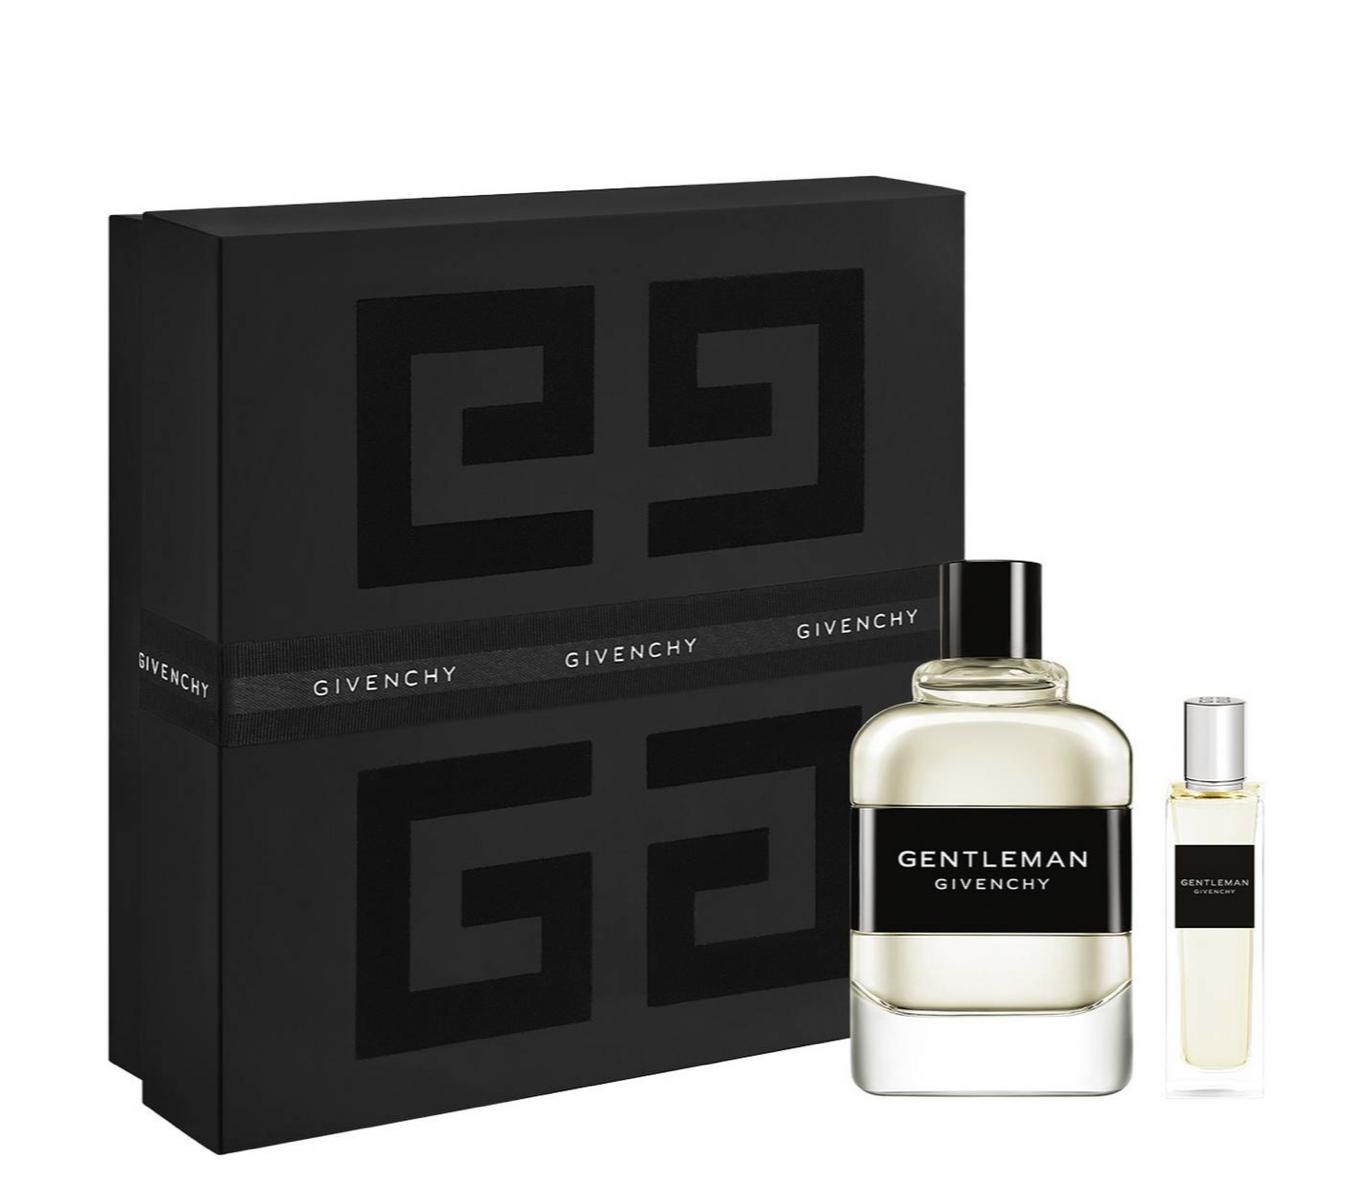 GIVENCHY - 'Gentleman' Eau de Toilette Gift Set £48.57 @ Debenhams